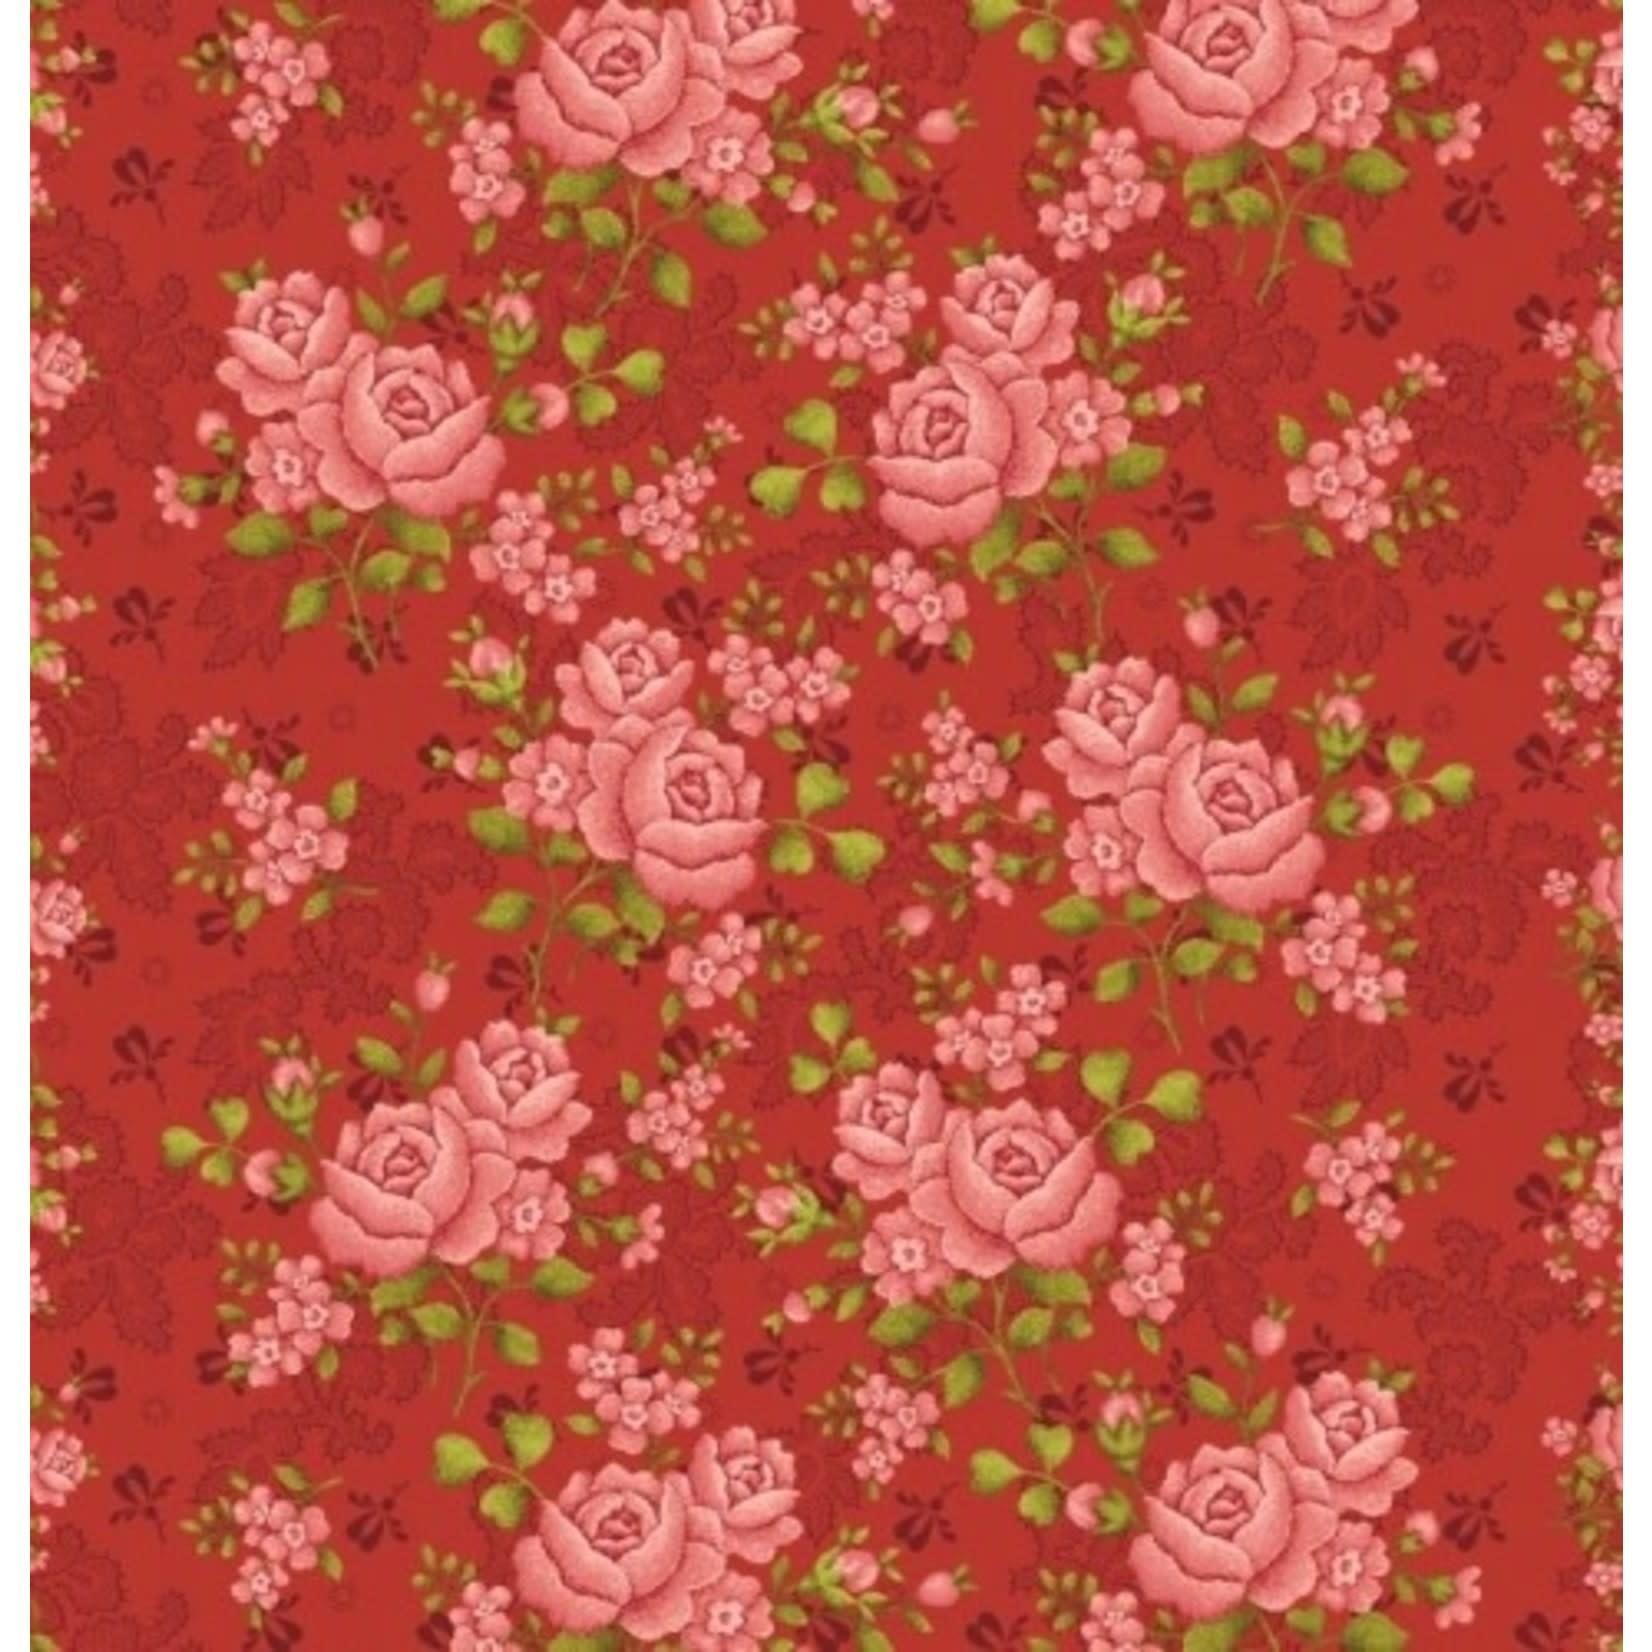 Benartex Studio Homestead Carriage - Climbing Rose - Red - Coupon - 130 cm x 275 cm